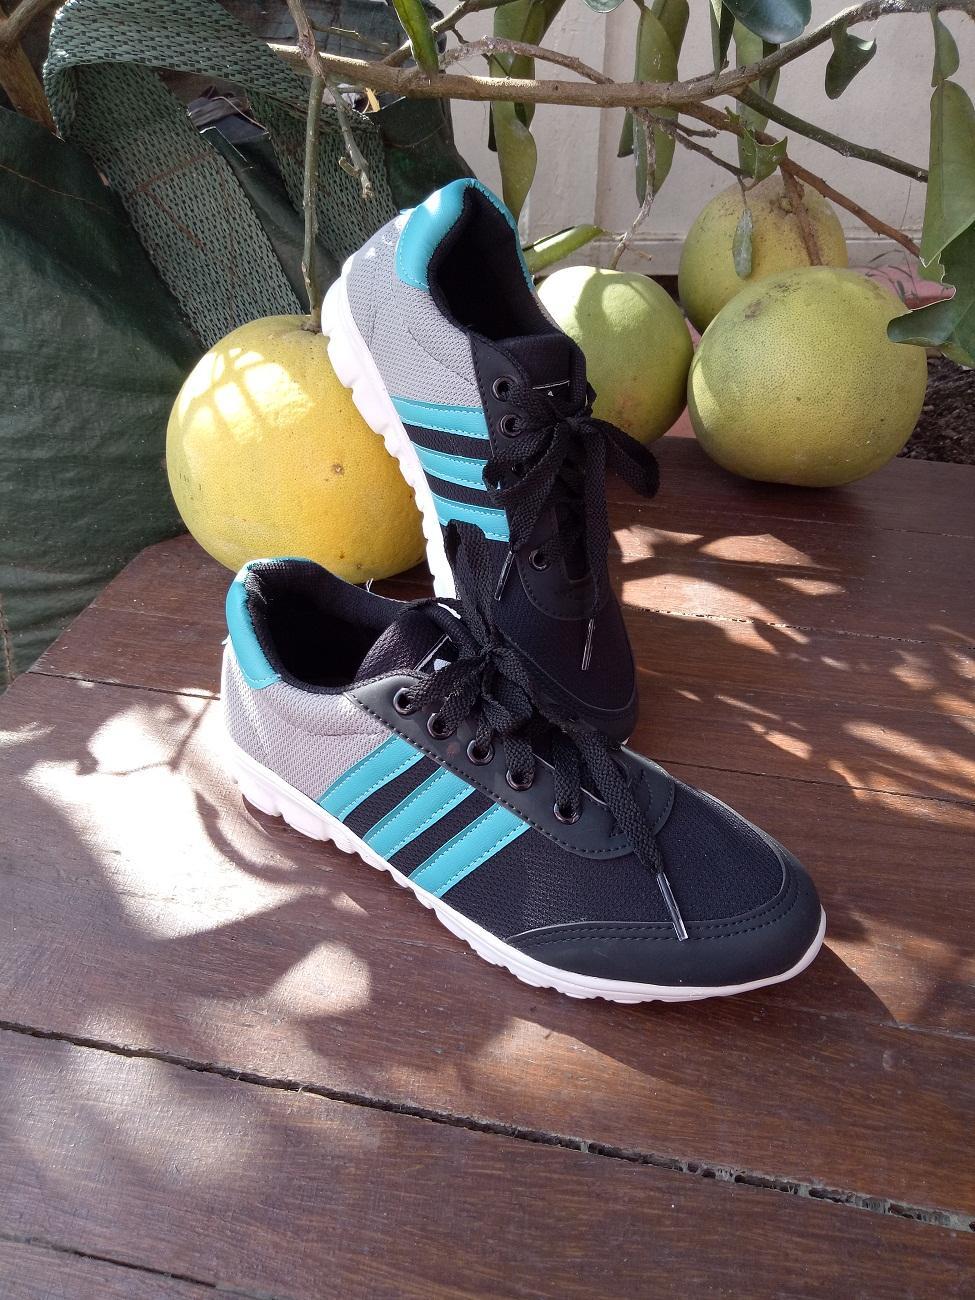 King Queen Shoes /sepatu / Sepatu wanita Terlaris /  Nike Air Max / Sneakers / Kets / Fashion  Wanita / Sepatu Casual Wanita / Sepatu Olah Raga / Sepatu Wanita sneakers / Casual / Promo / Kekinian / Terkini Model adj 10 blue